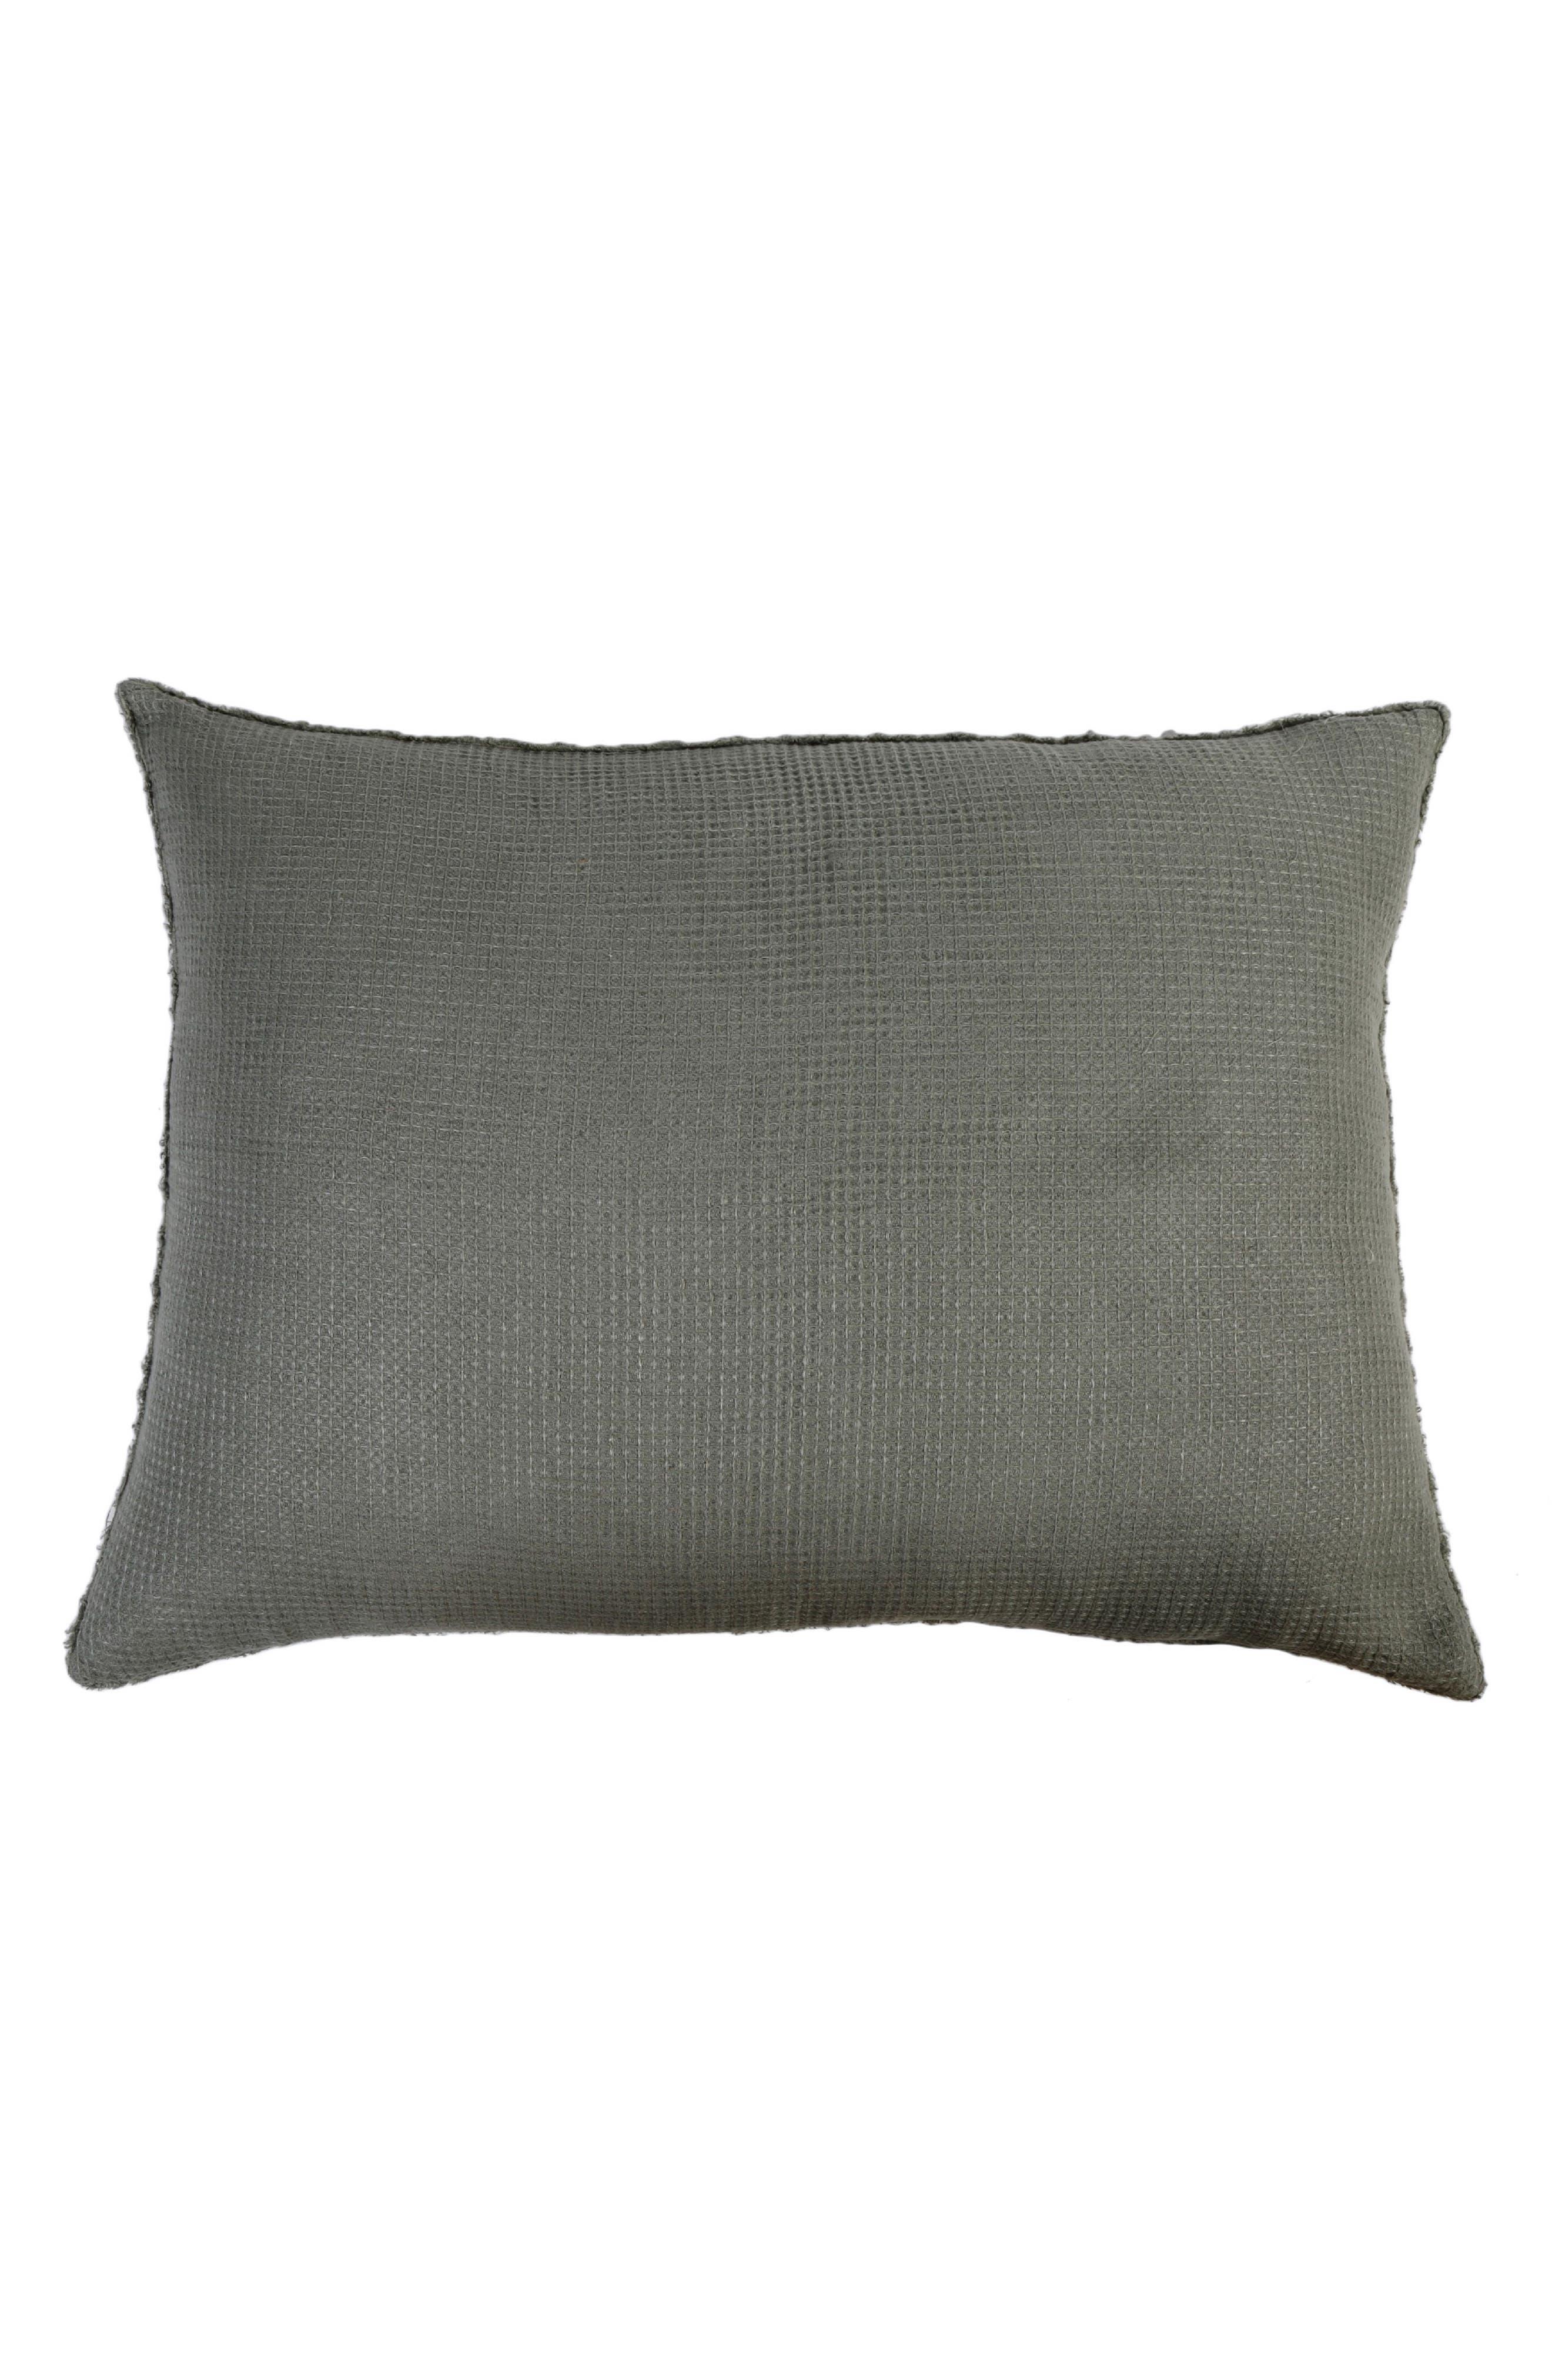 Venice Accent Pillow,                         Main,                         color, MOSS